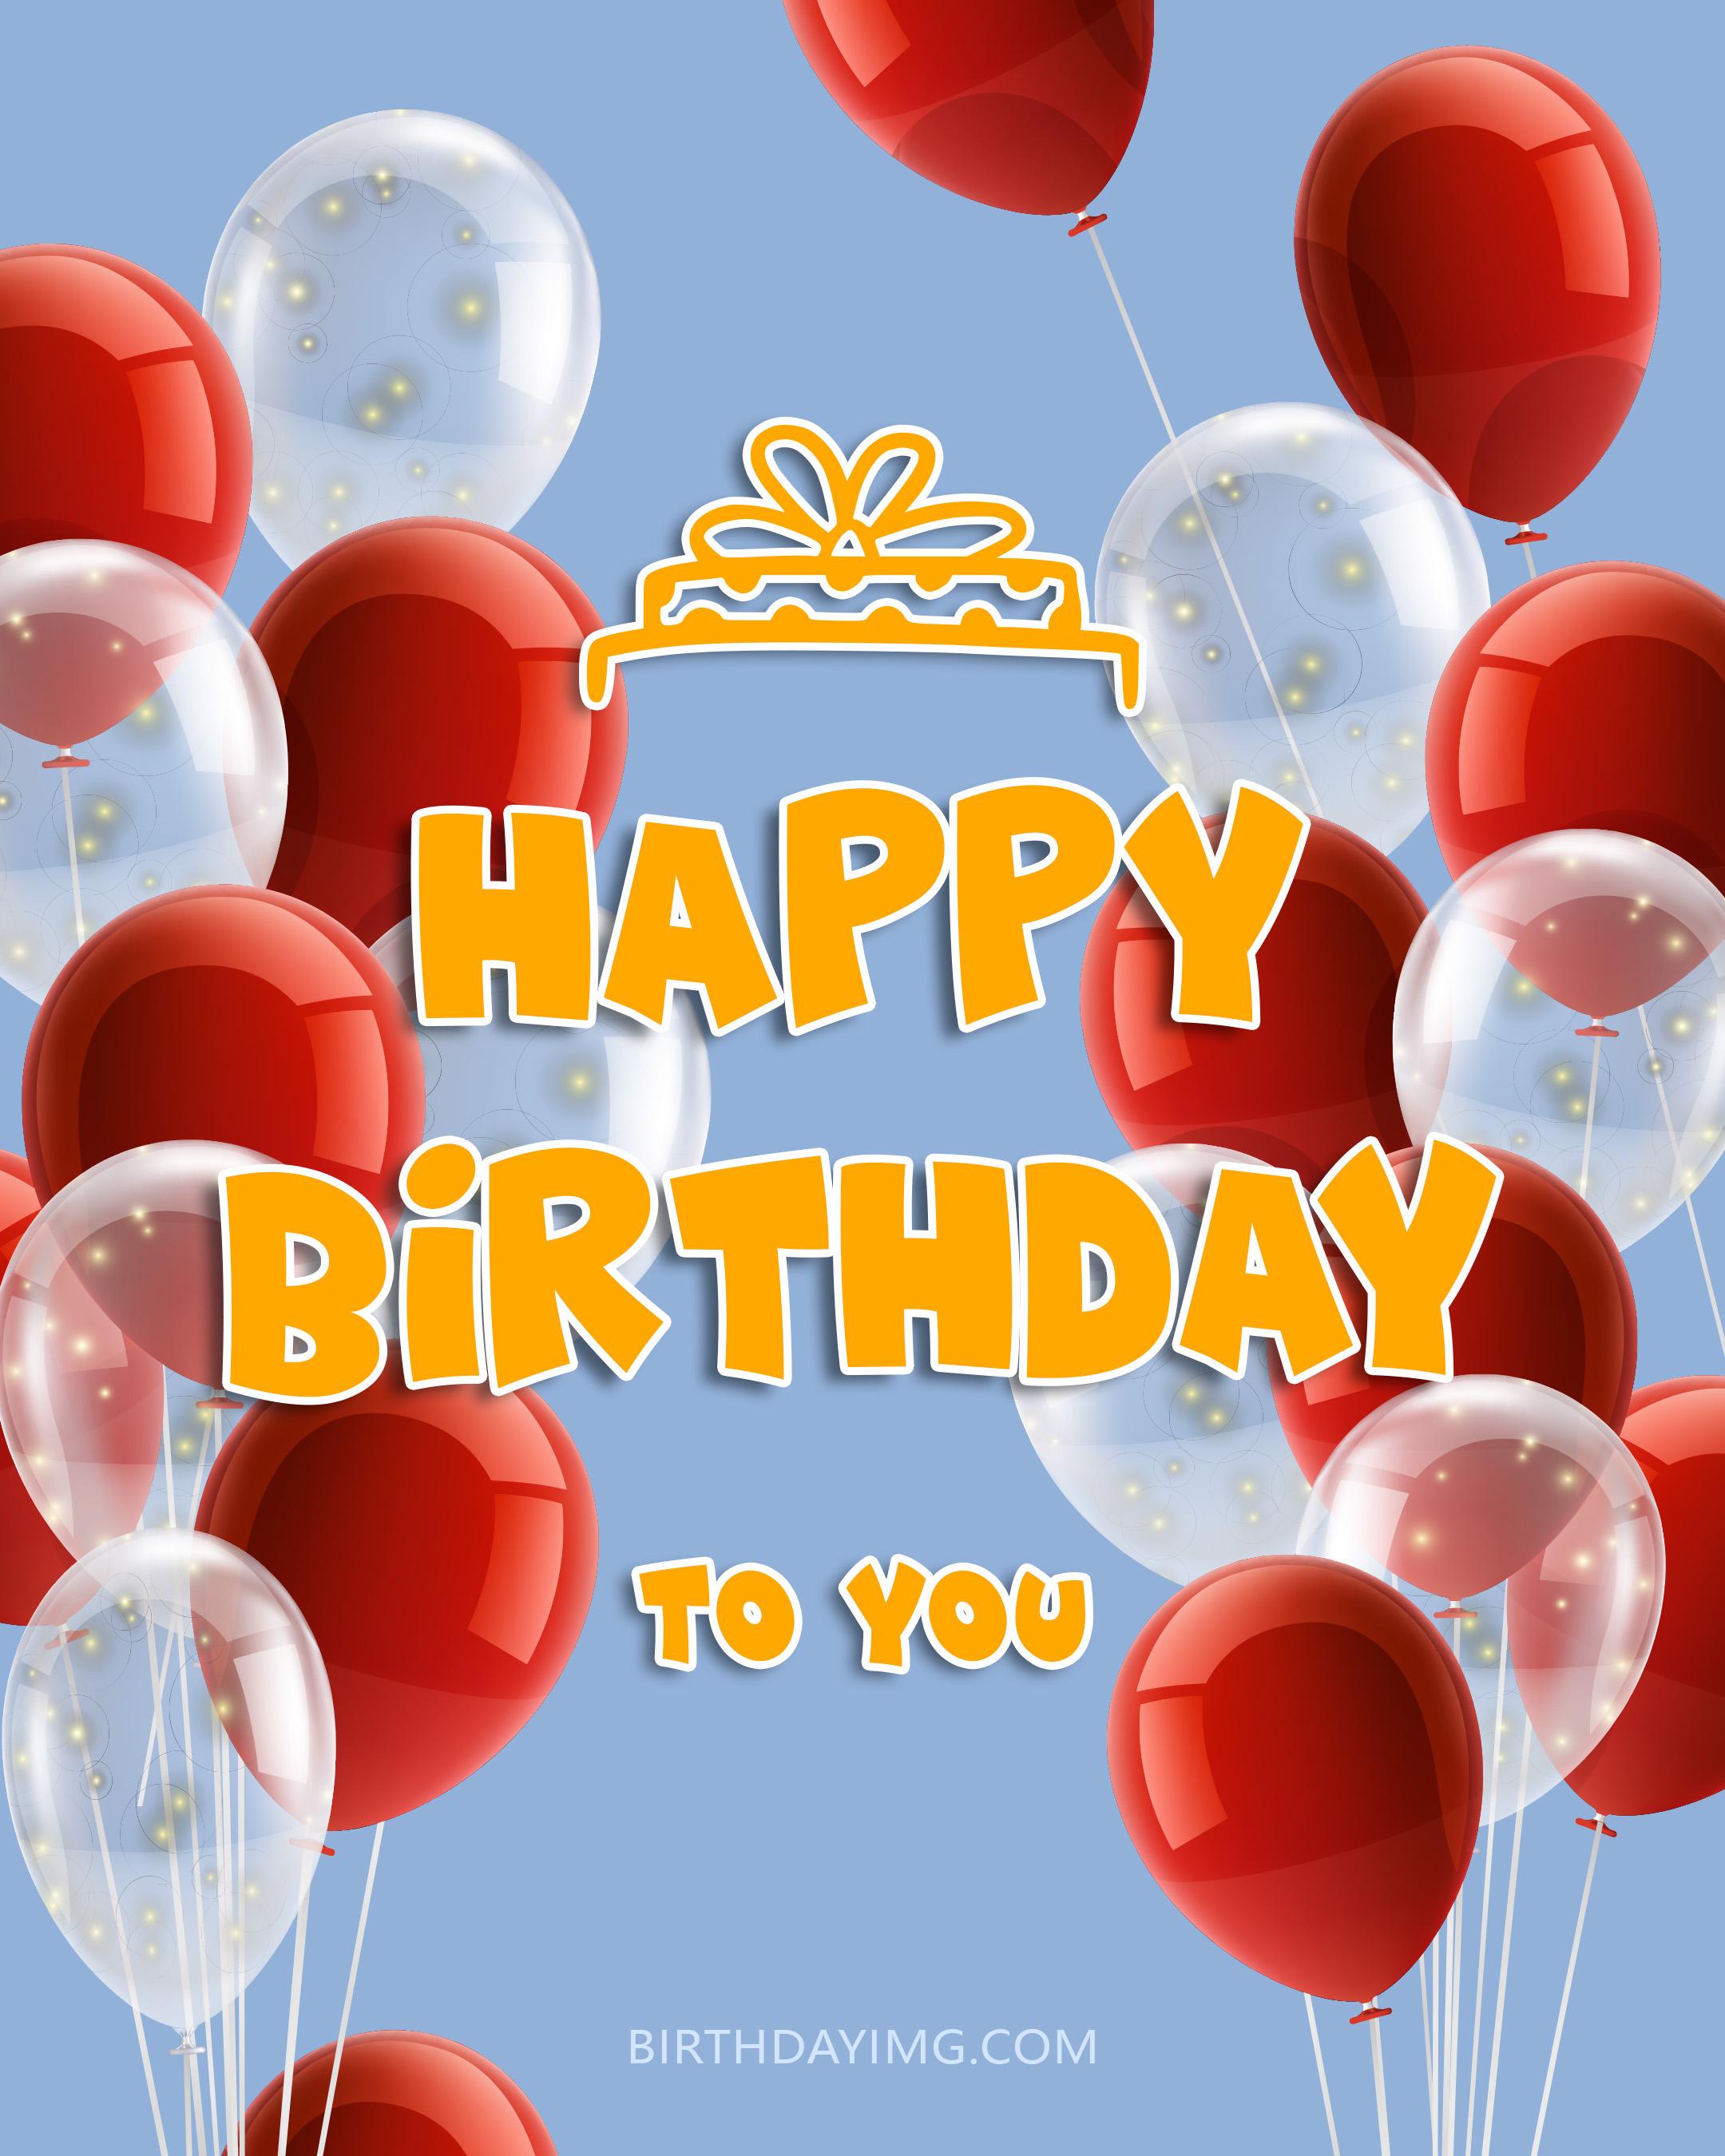 Free Happy Birthday Image With Red Balloons - birthdayimg.com